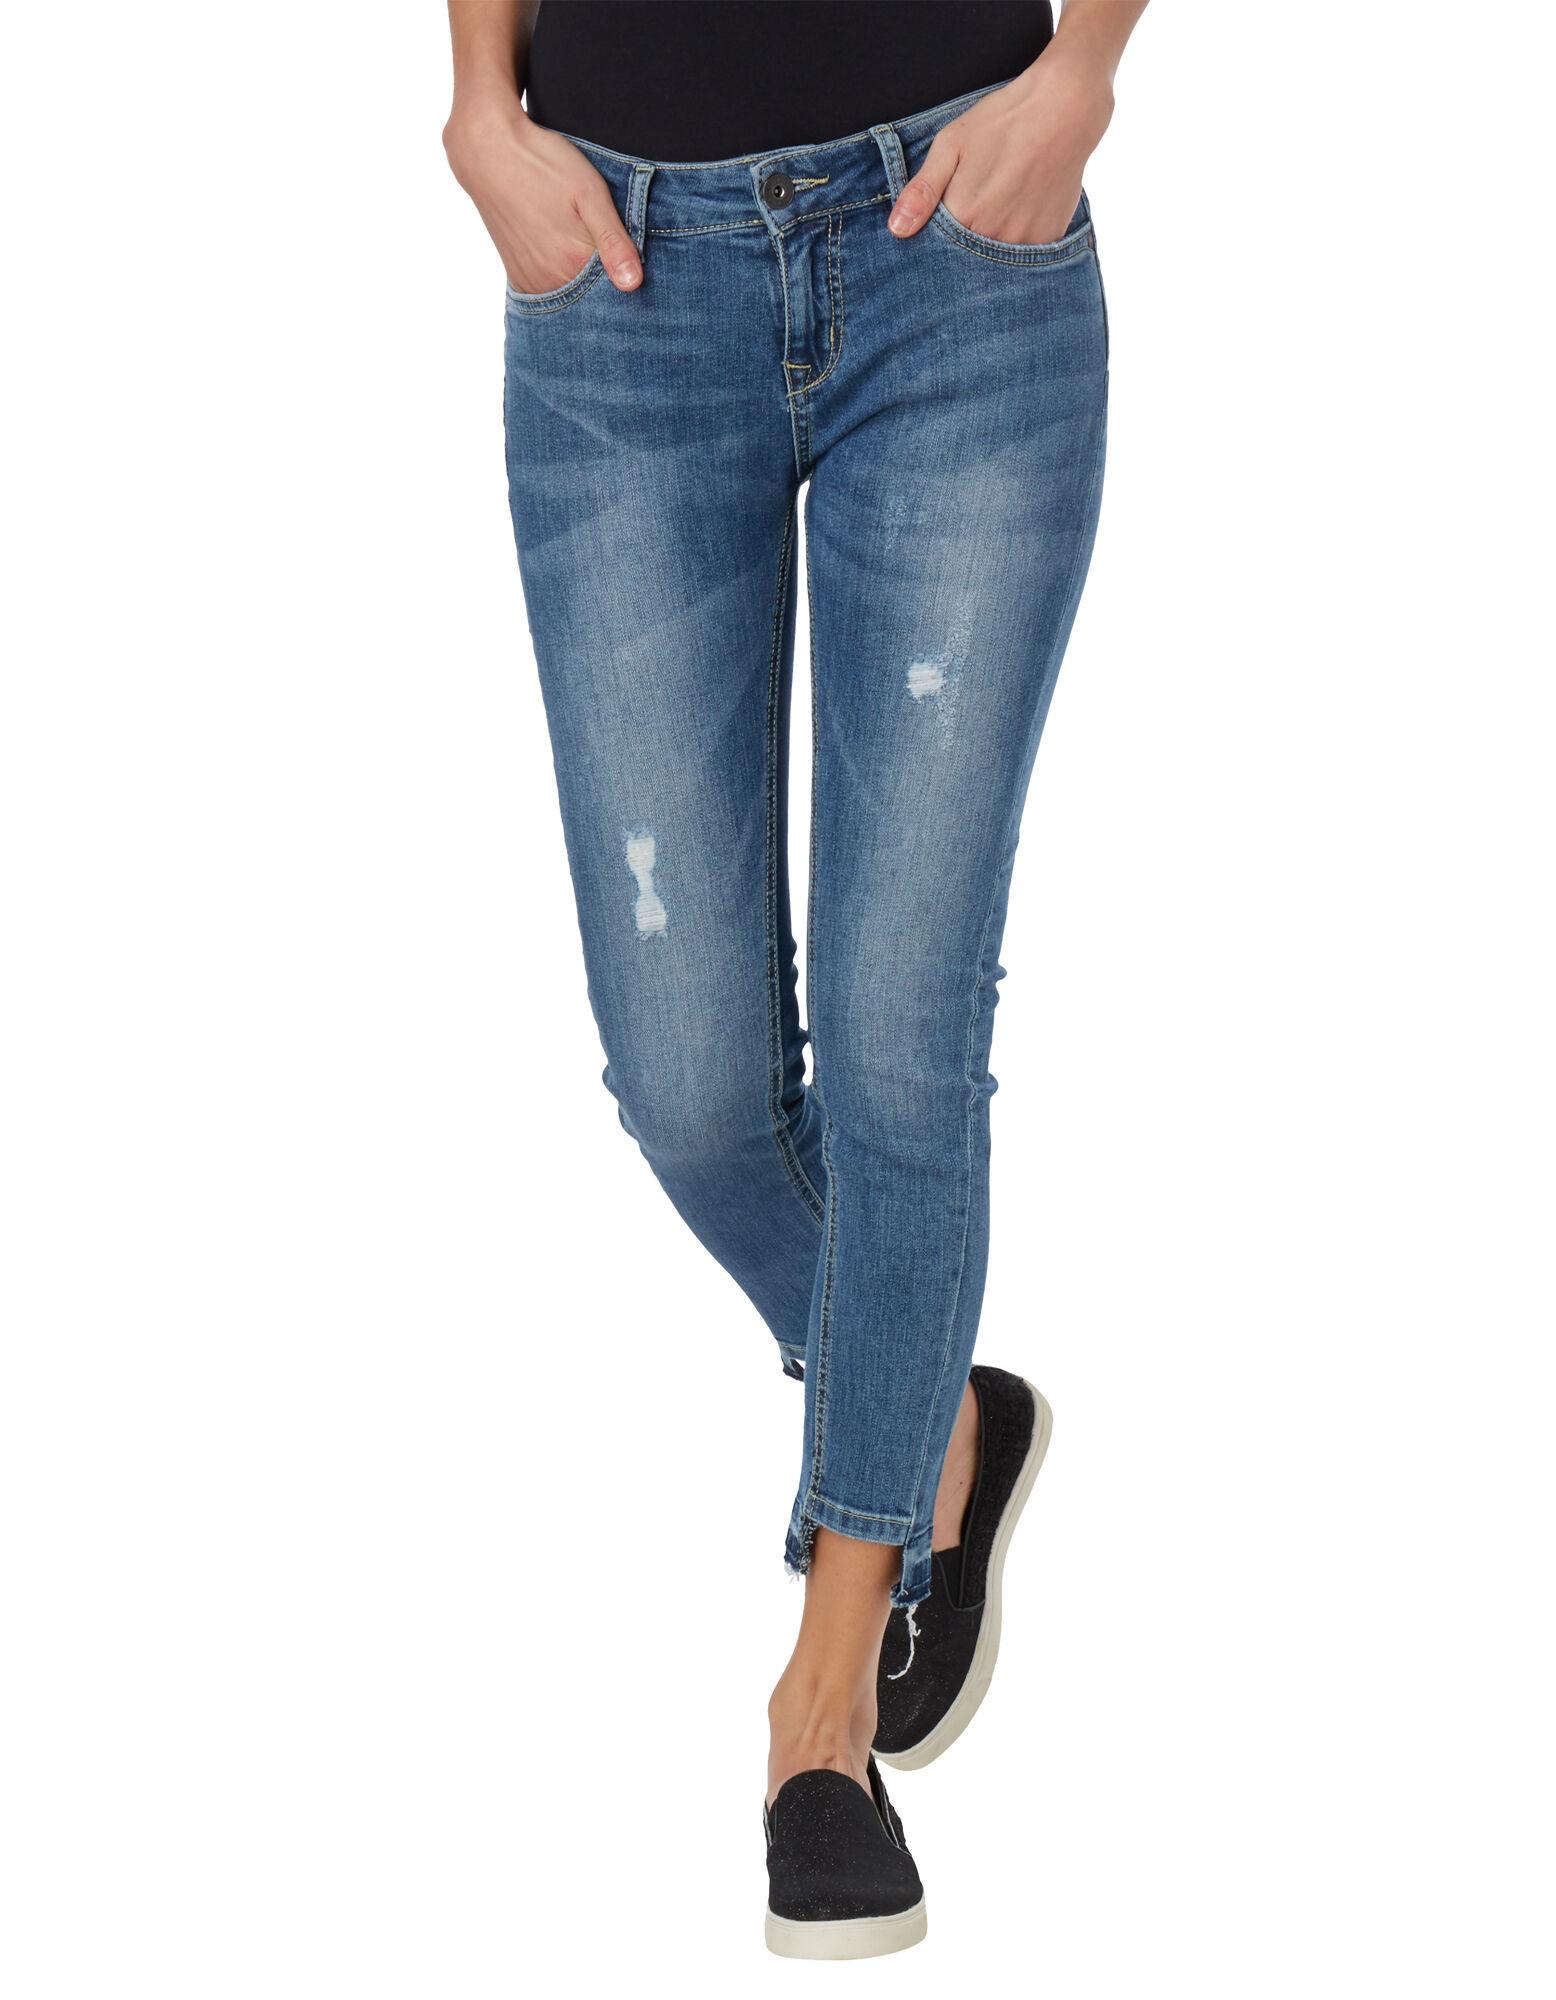 Damen jeans bei takko